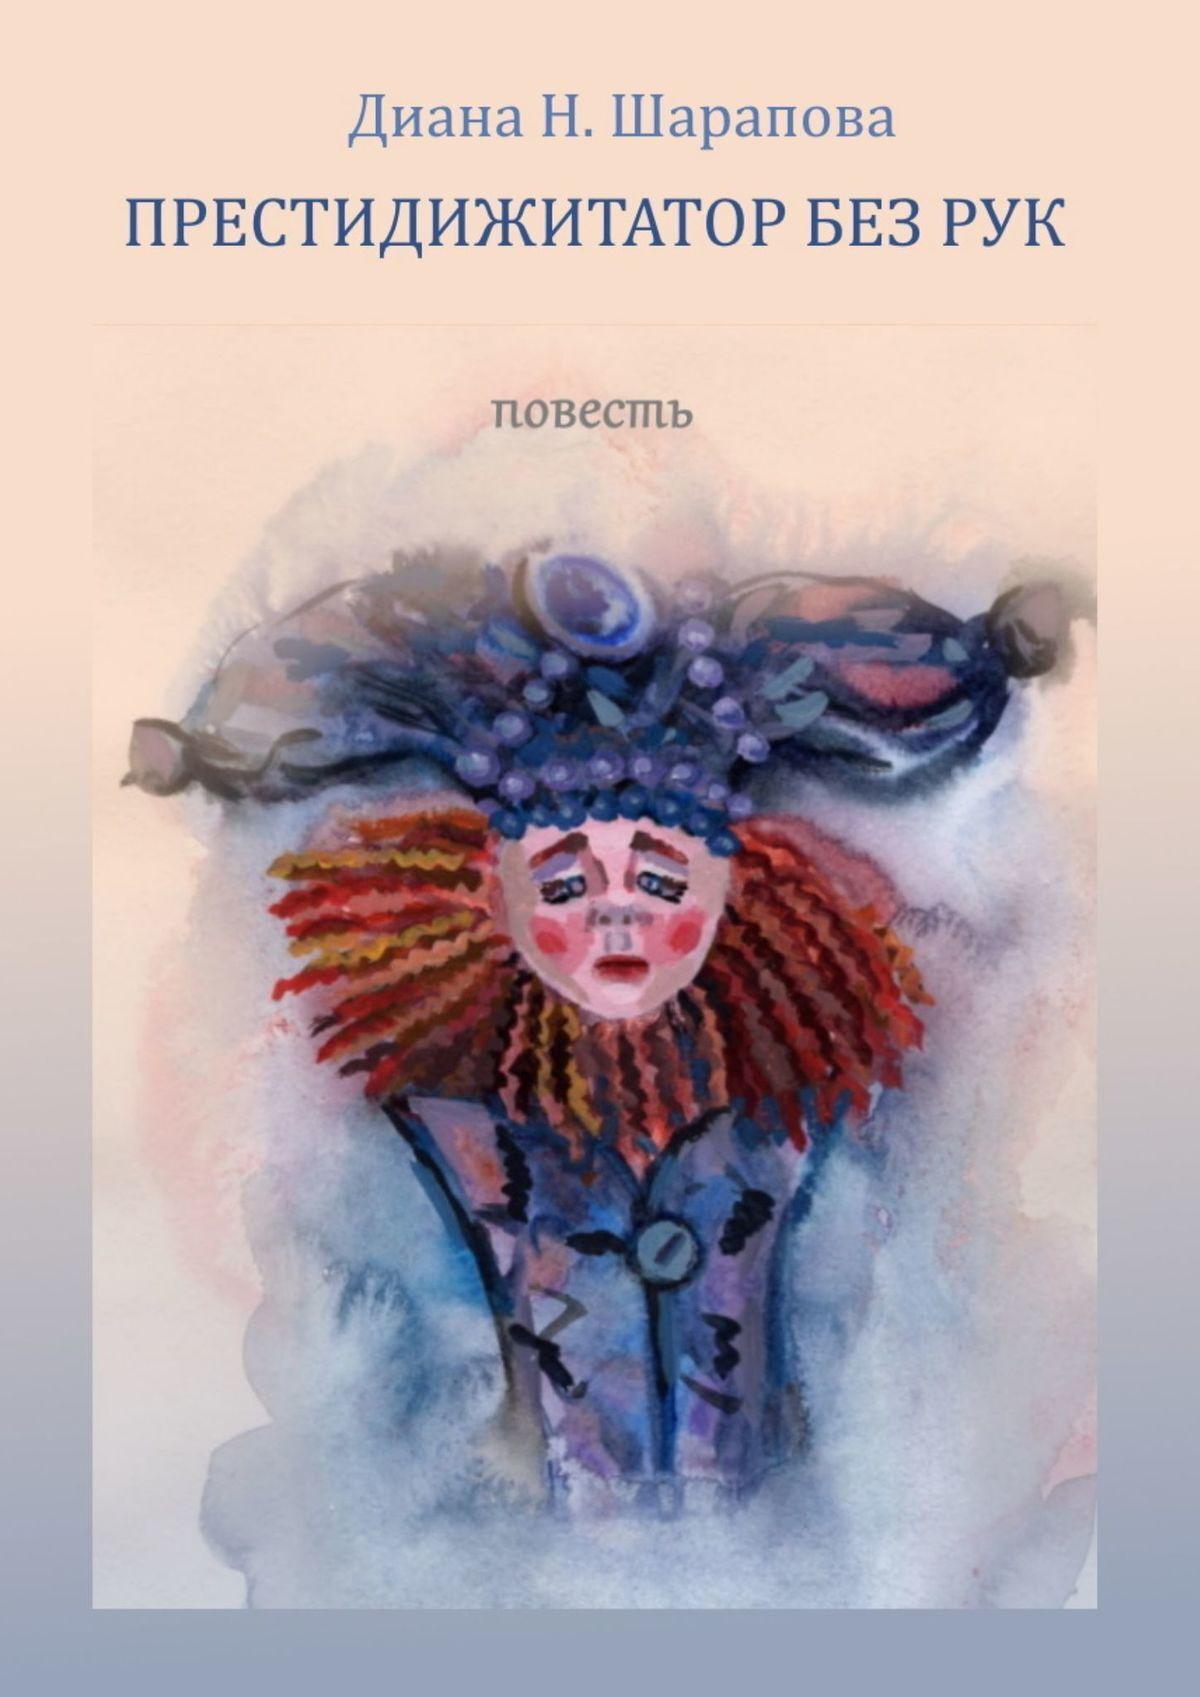 Диана Назимовна Шарапова Престидижитатор безрук